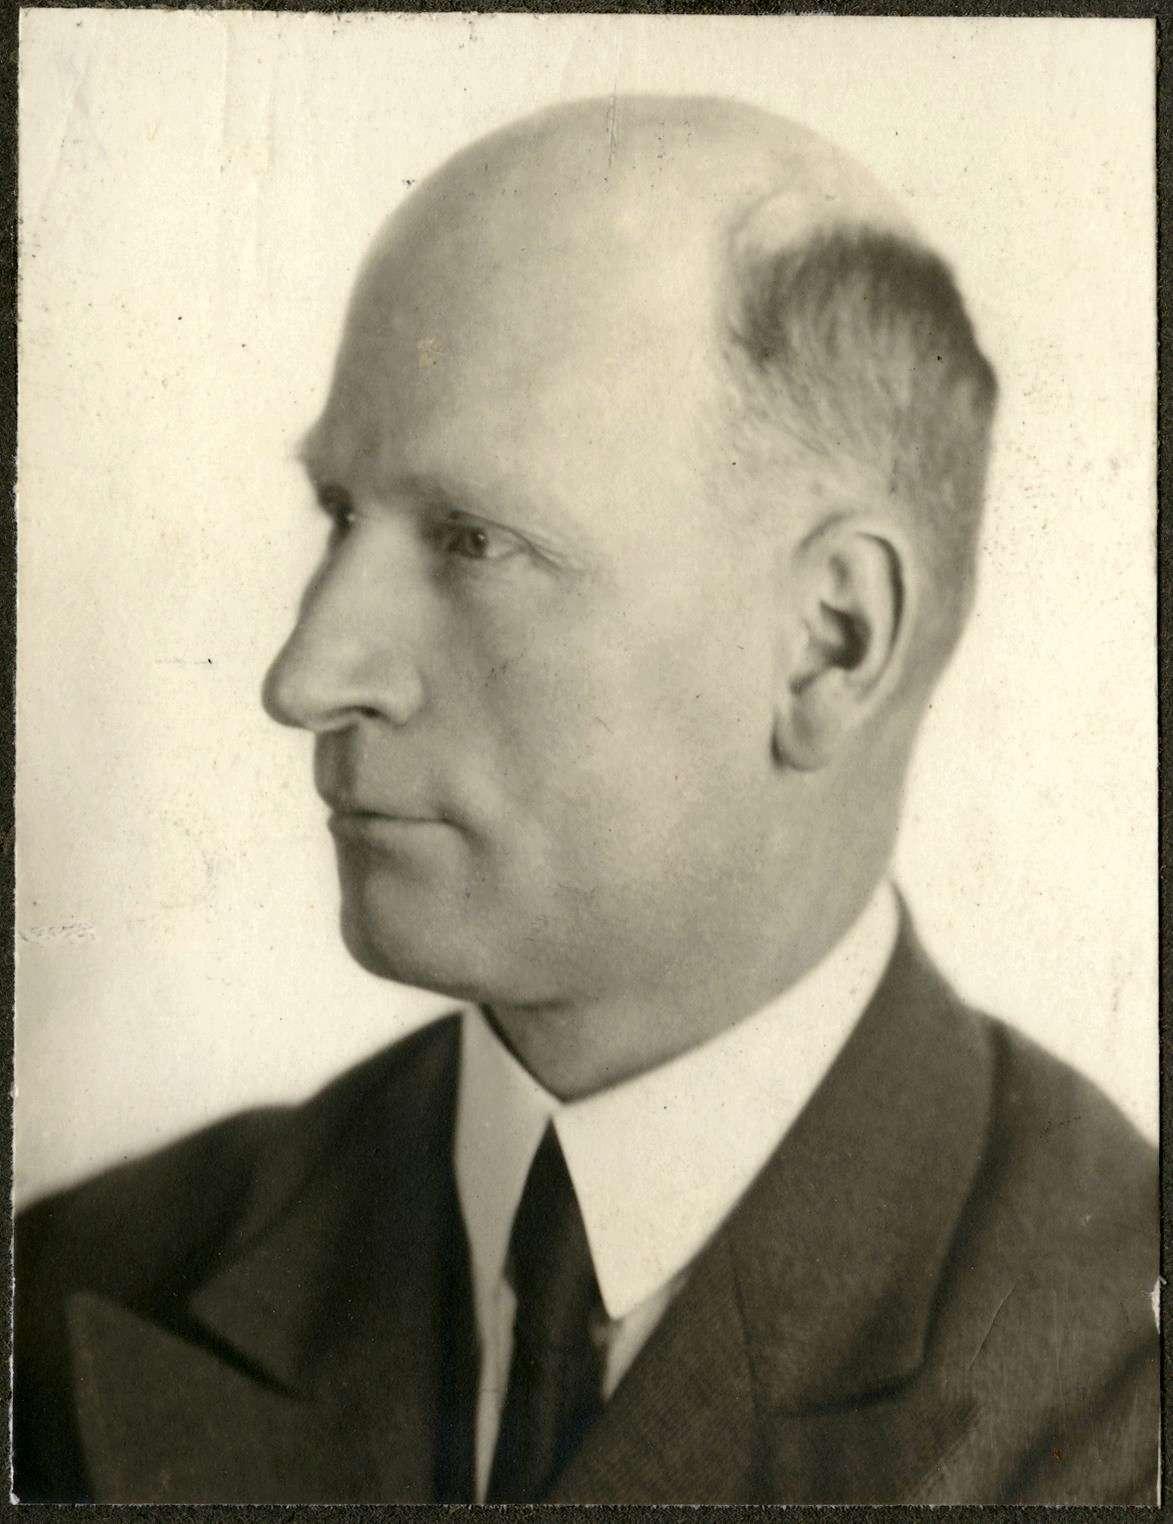 Haug, Eberhard, Bild 2